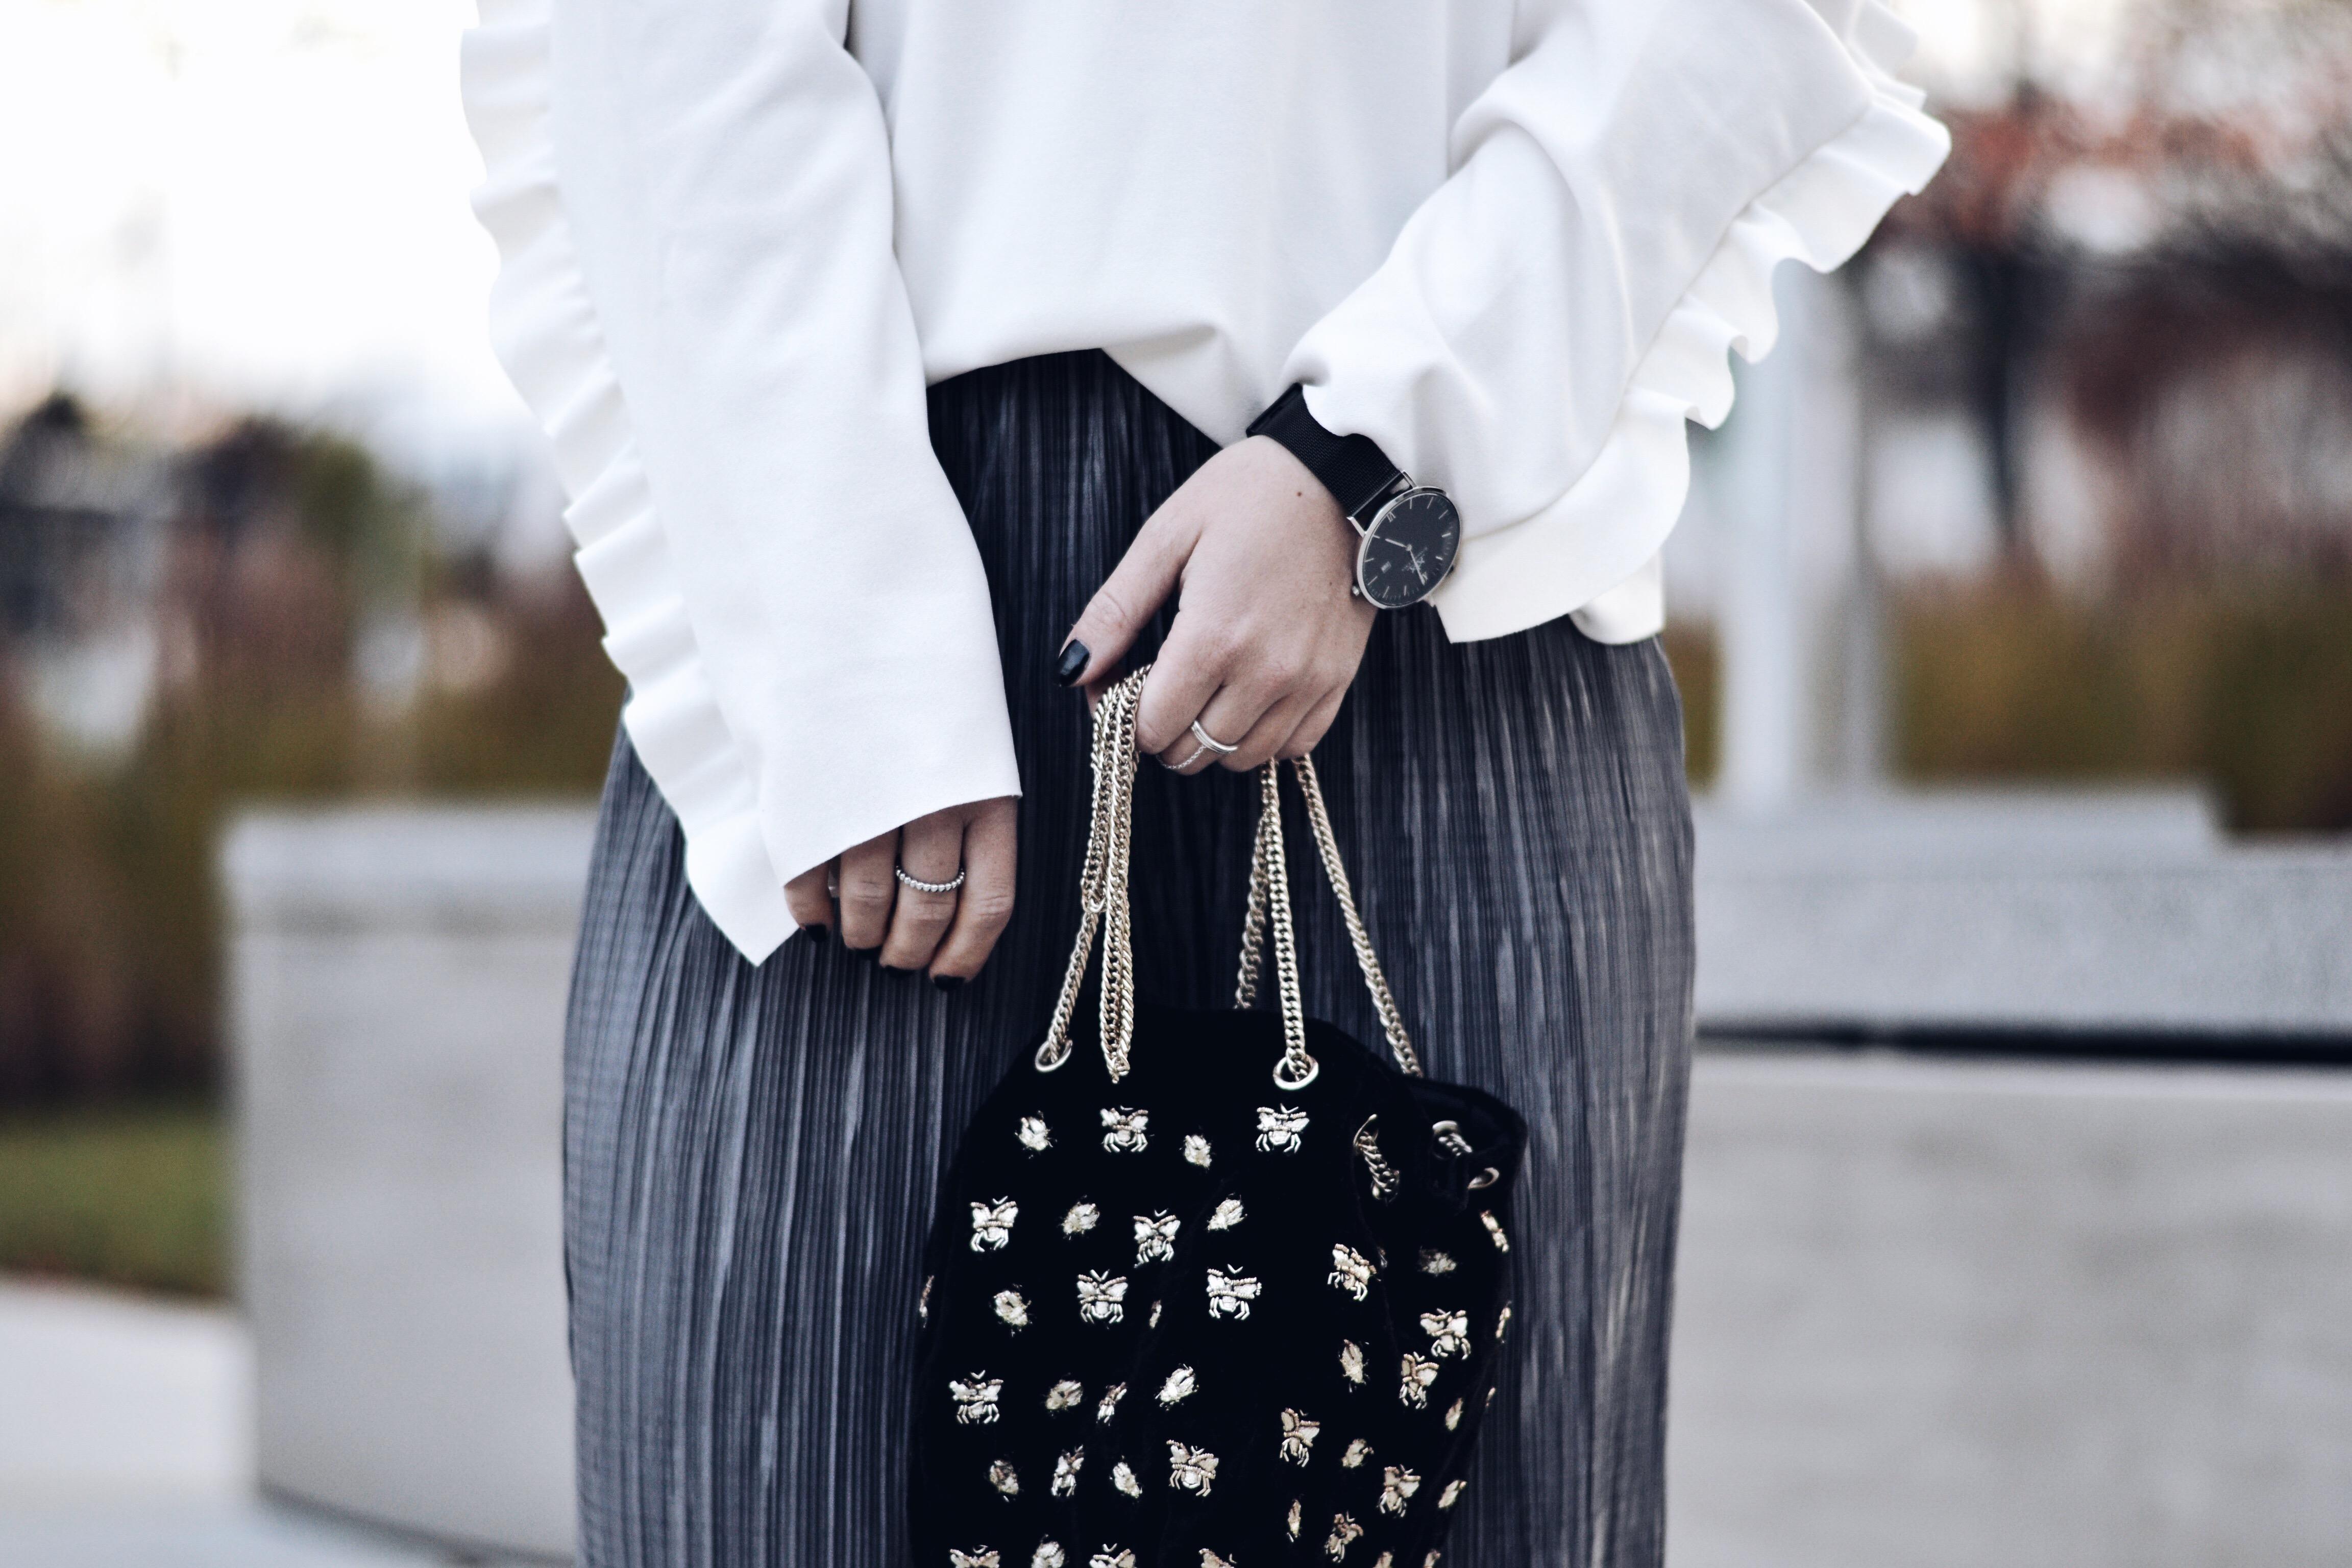 allthatchoices by laura fashionblog mainz fashionblogger plissehose rüschen oberteil zara longbob bucket bag